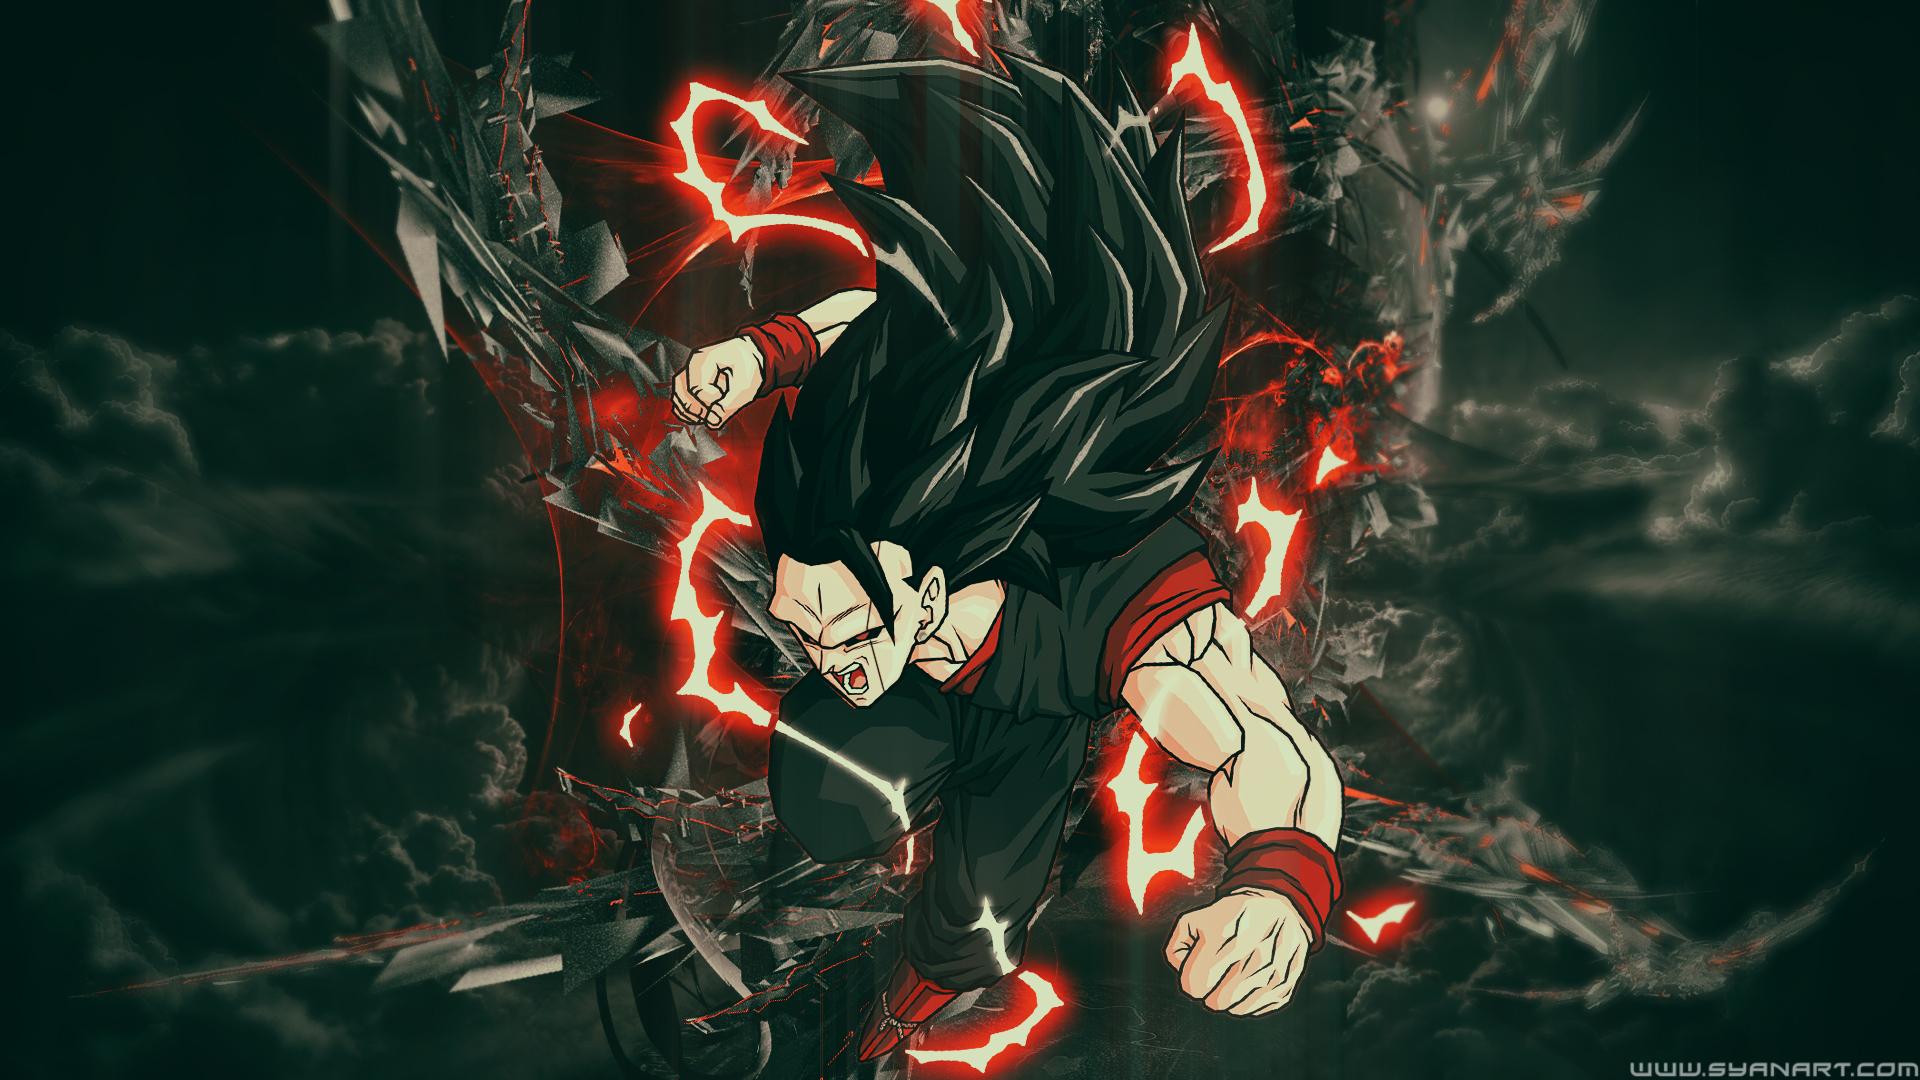 Dragon Ball Super Goku Black Full Hd Wallpaper Syanart Station